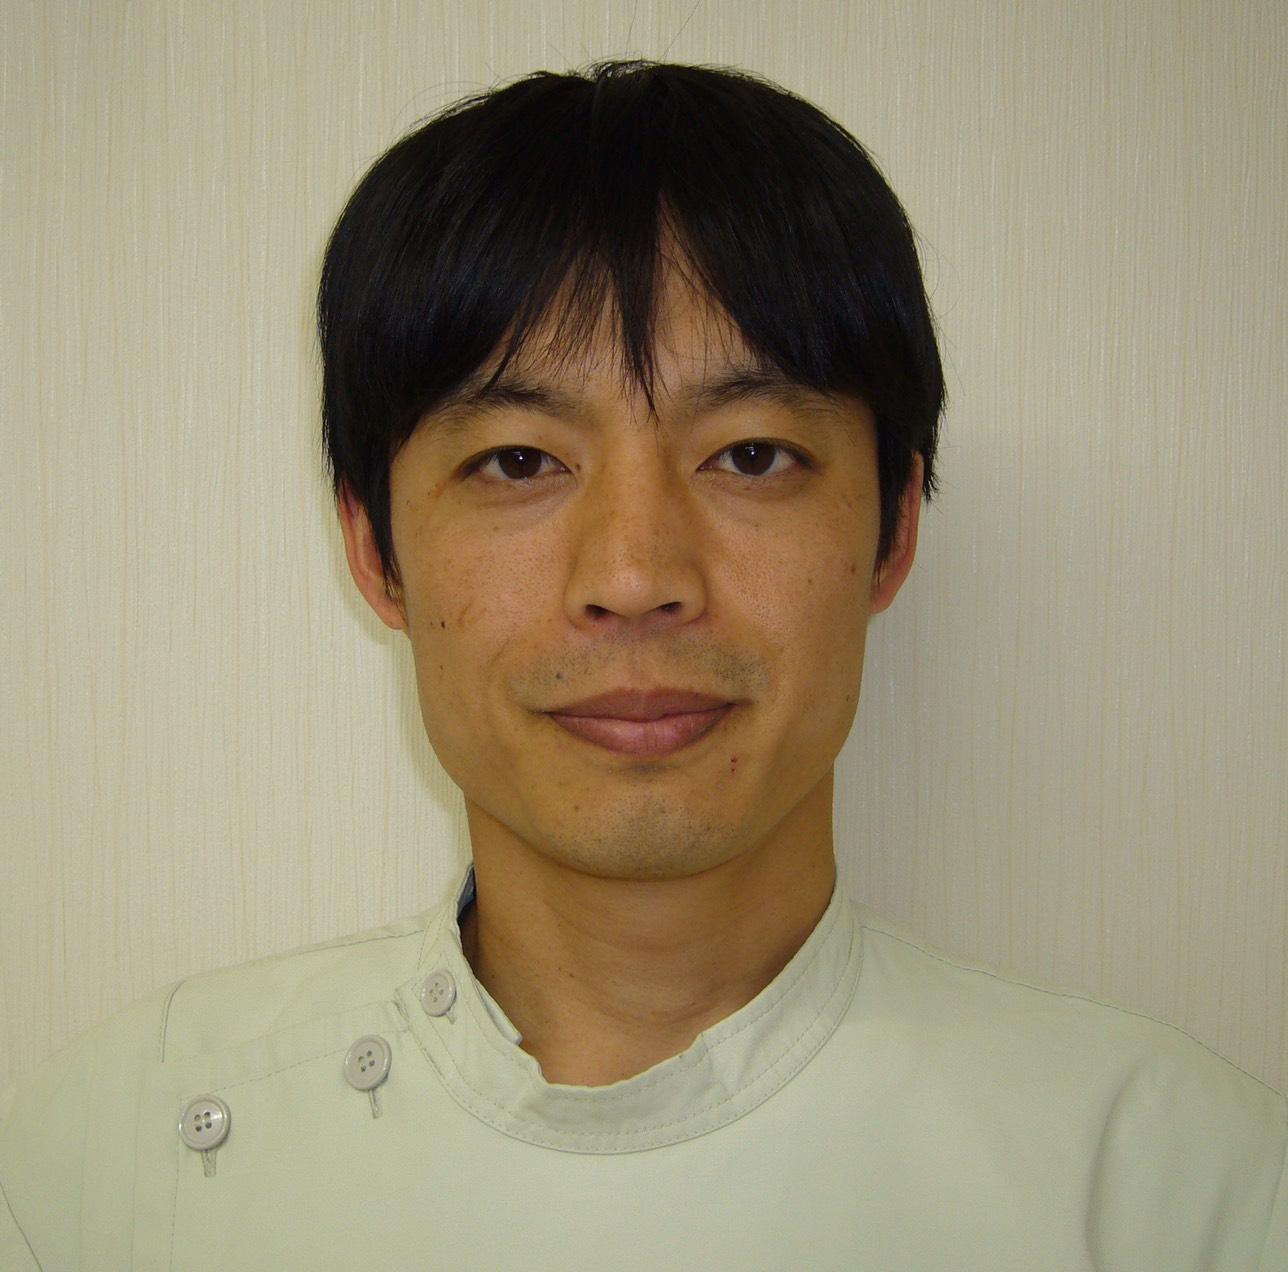 訪問治療部門の責任者兼役員 藤田先生